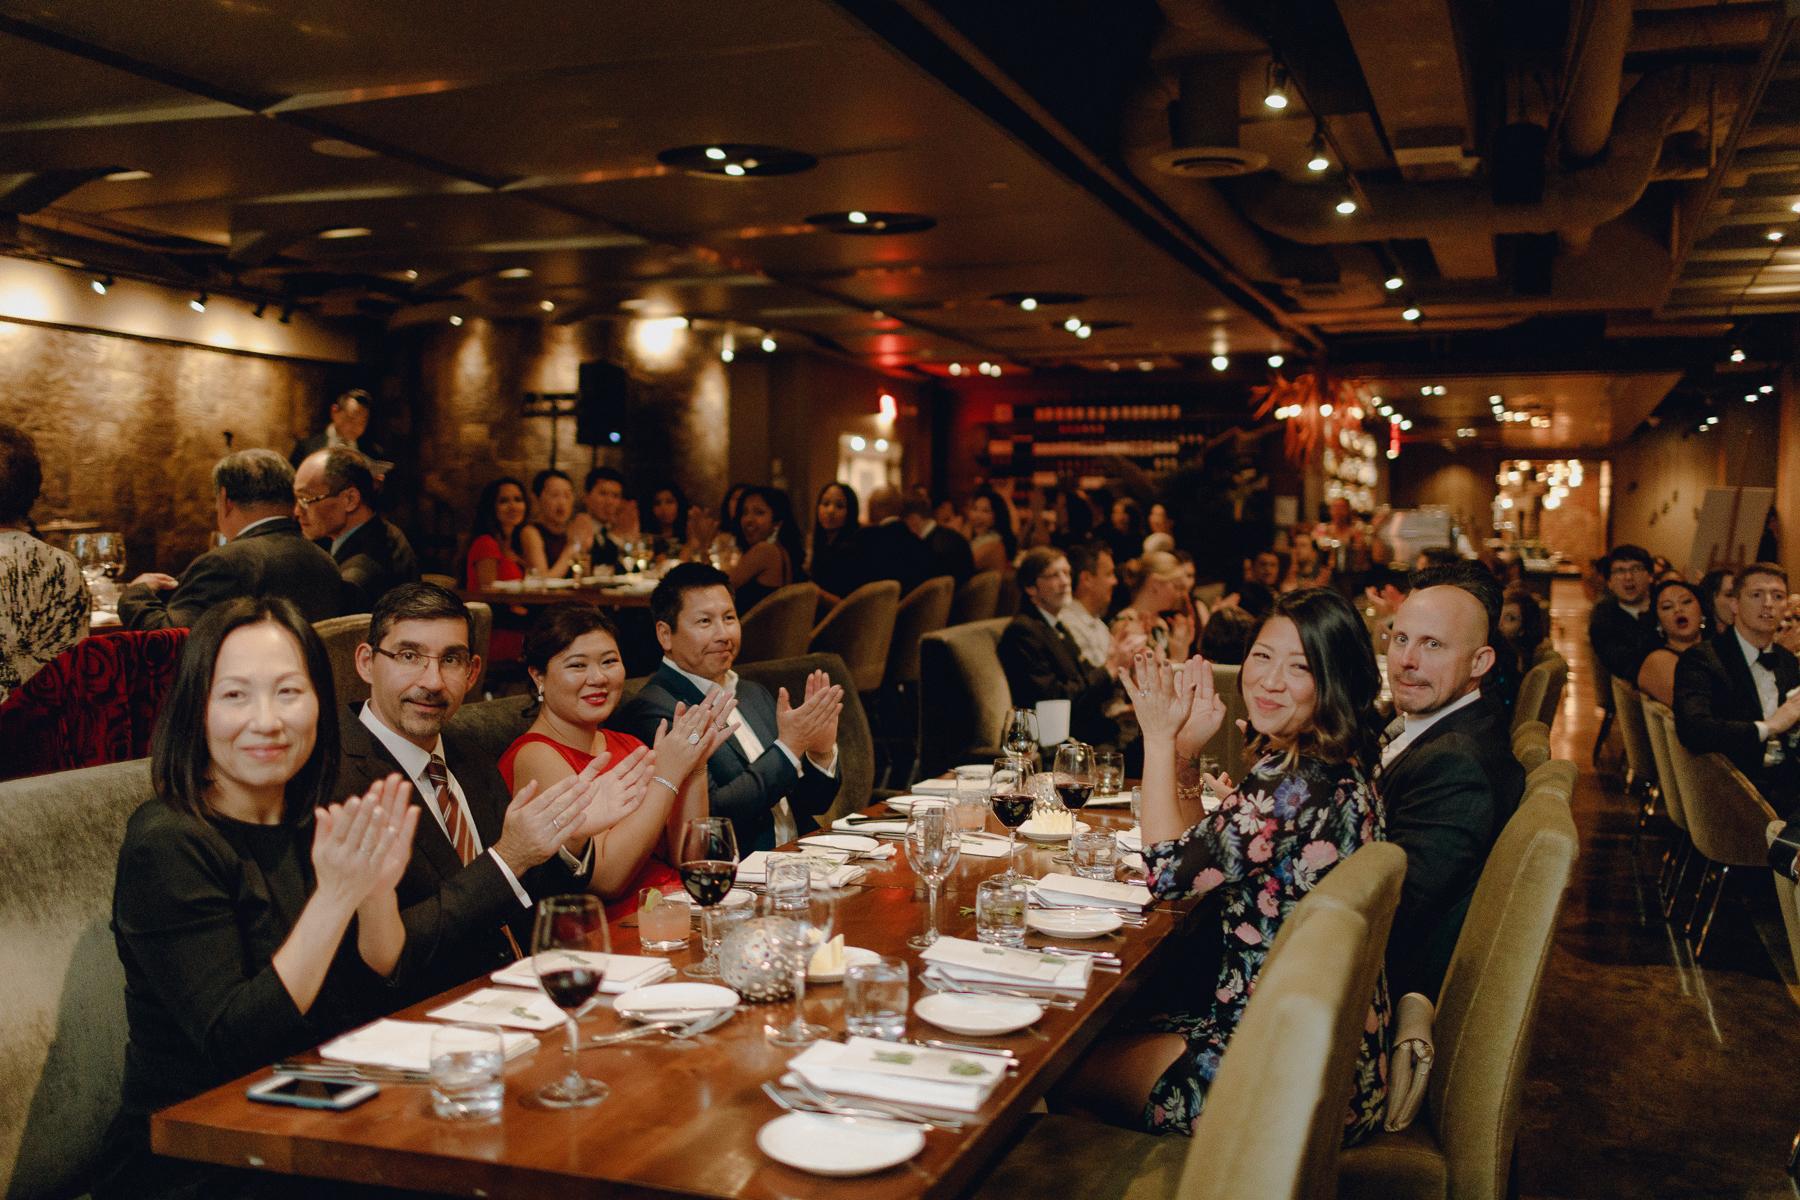 cannoe-restaurannt-wedding 0076.jpg